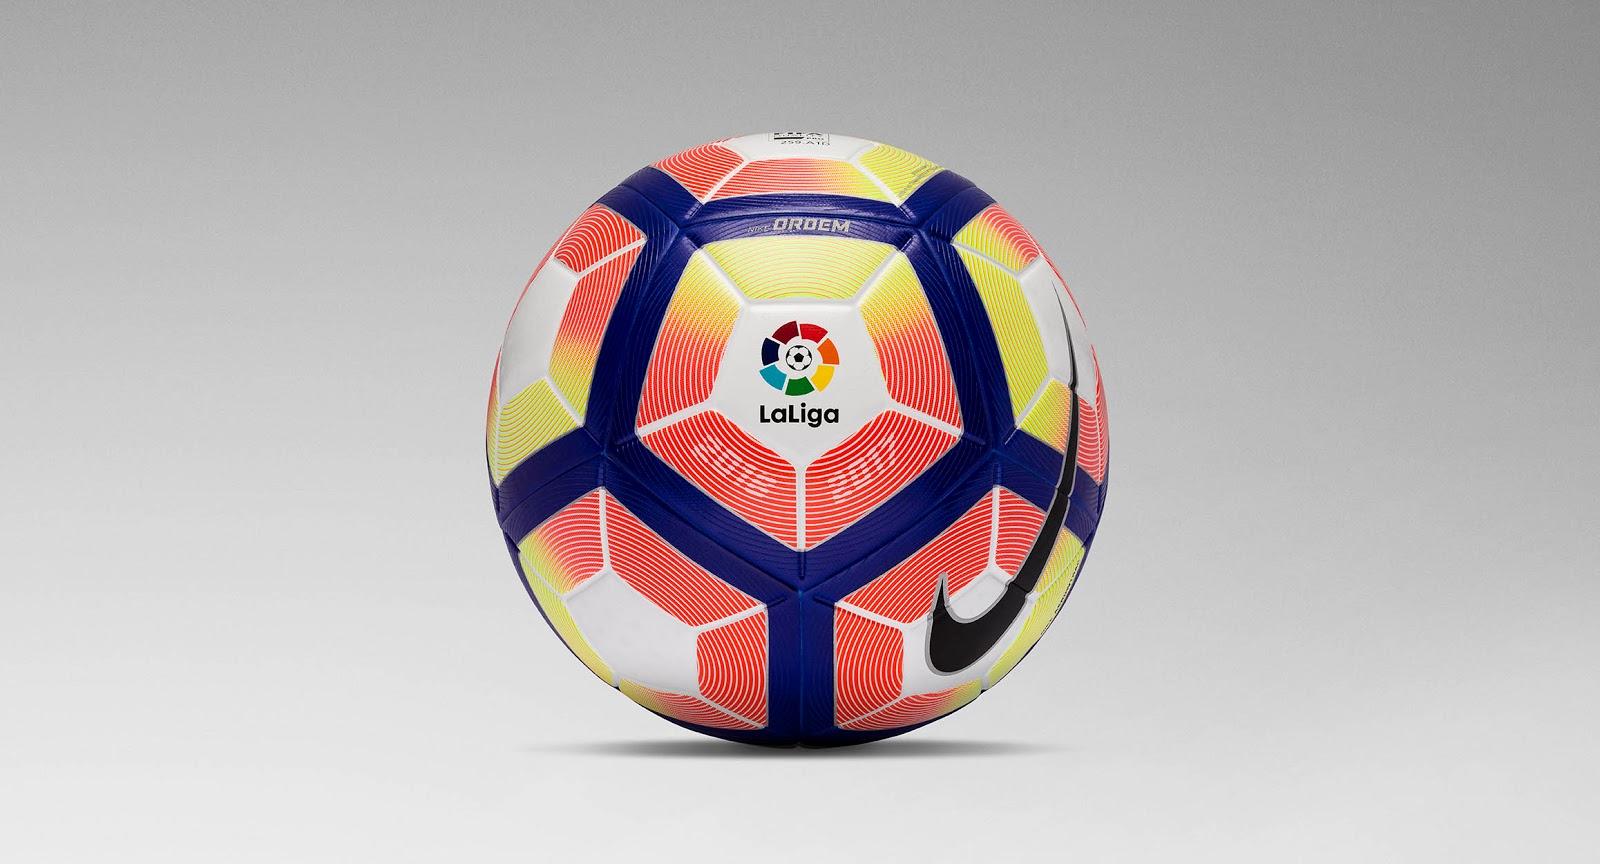 nike 1617 la liga ball revealed new ball deal announced